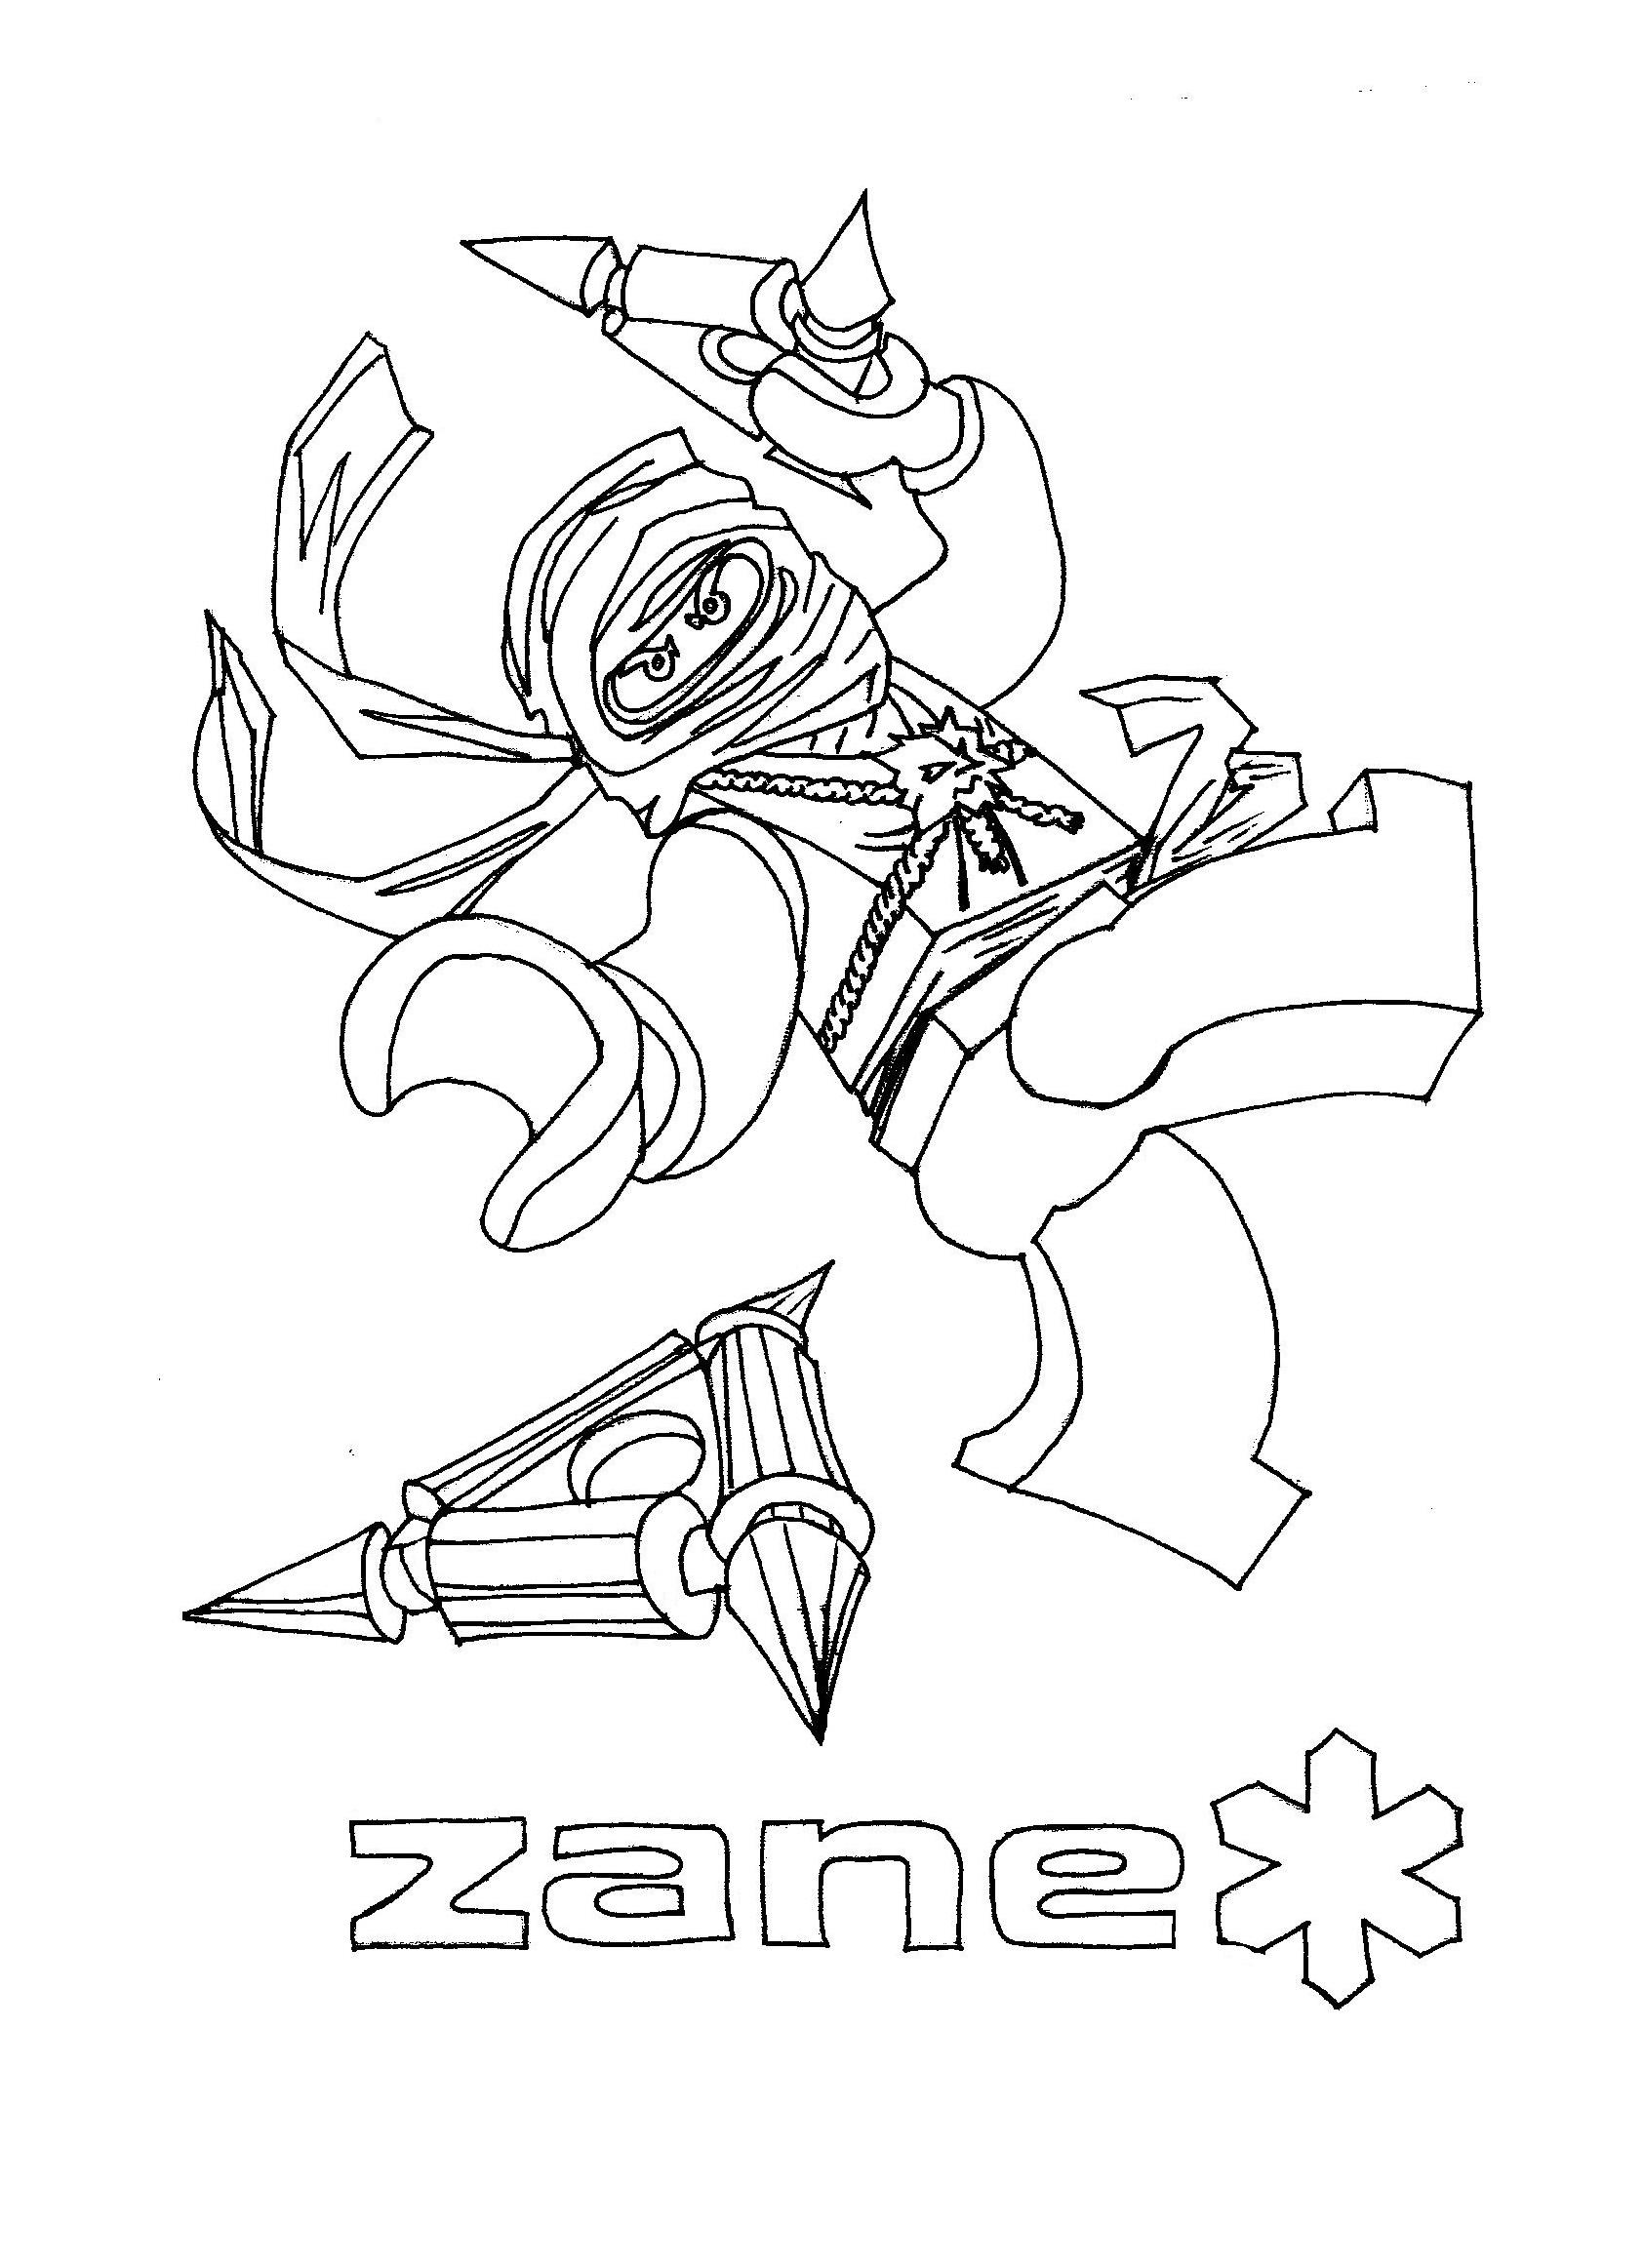 Coloriage ninjago gratuit - dessin a imprimer #19